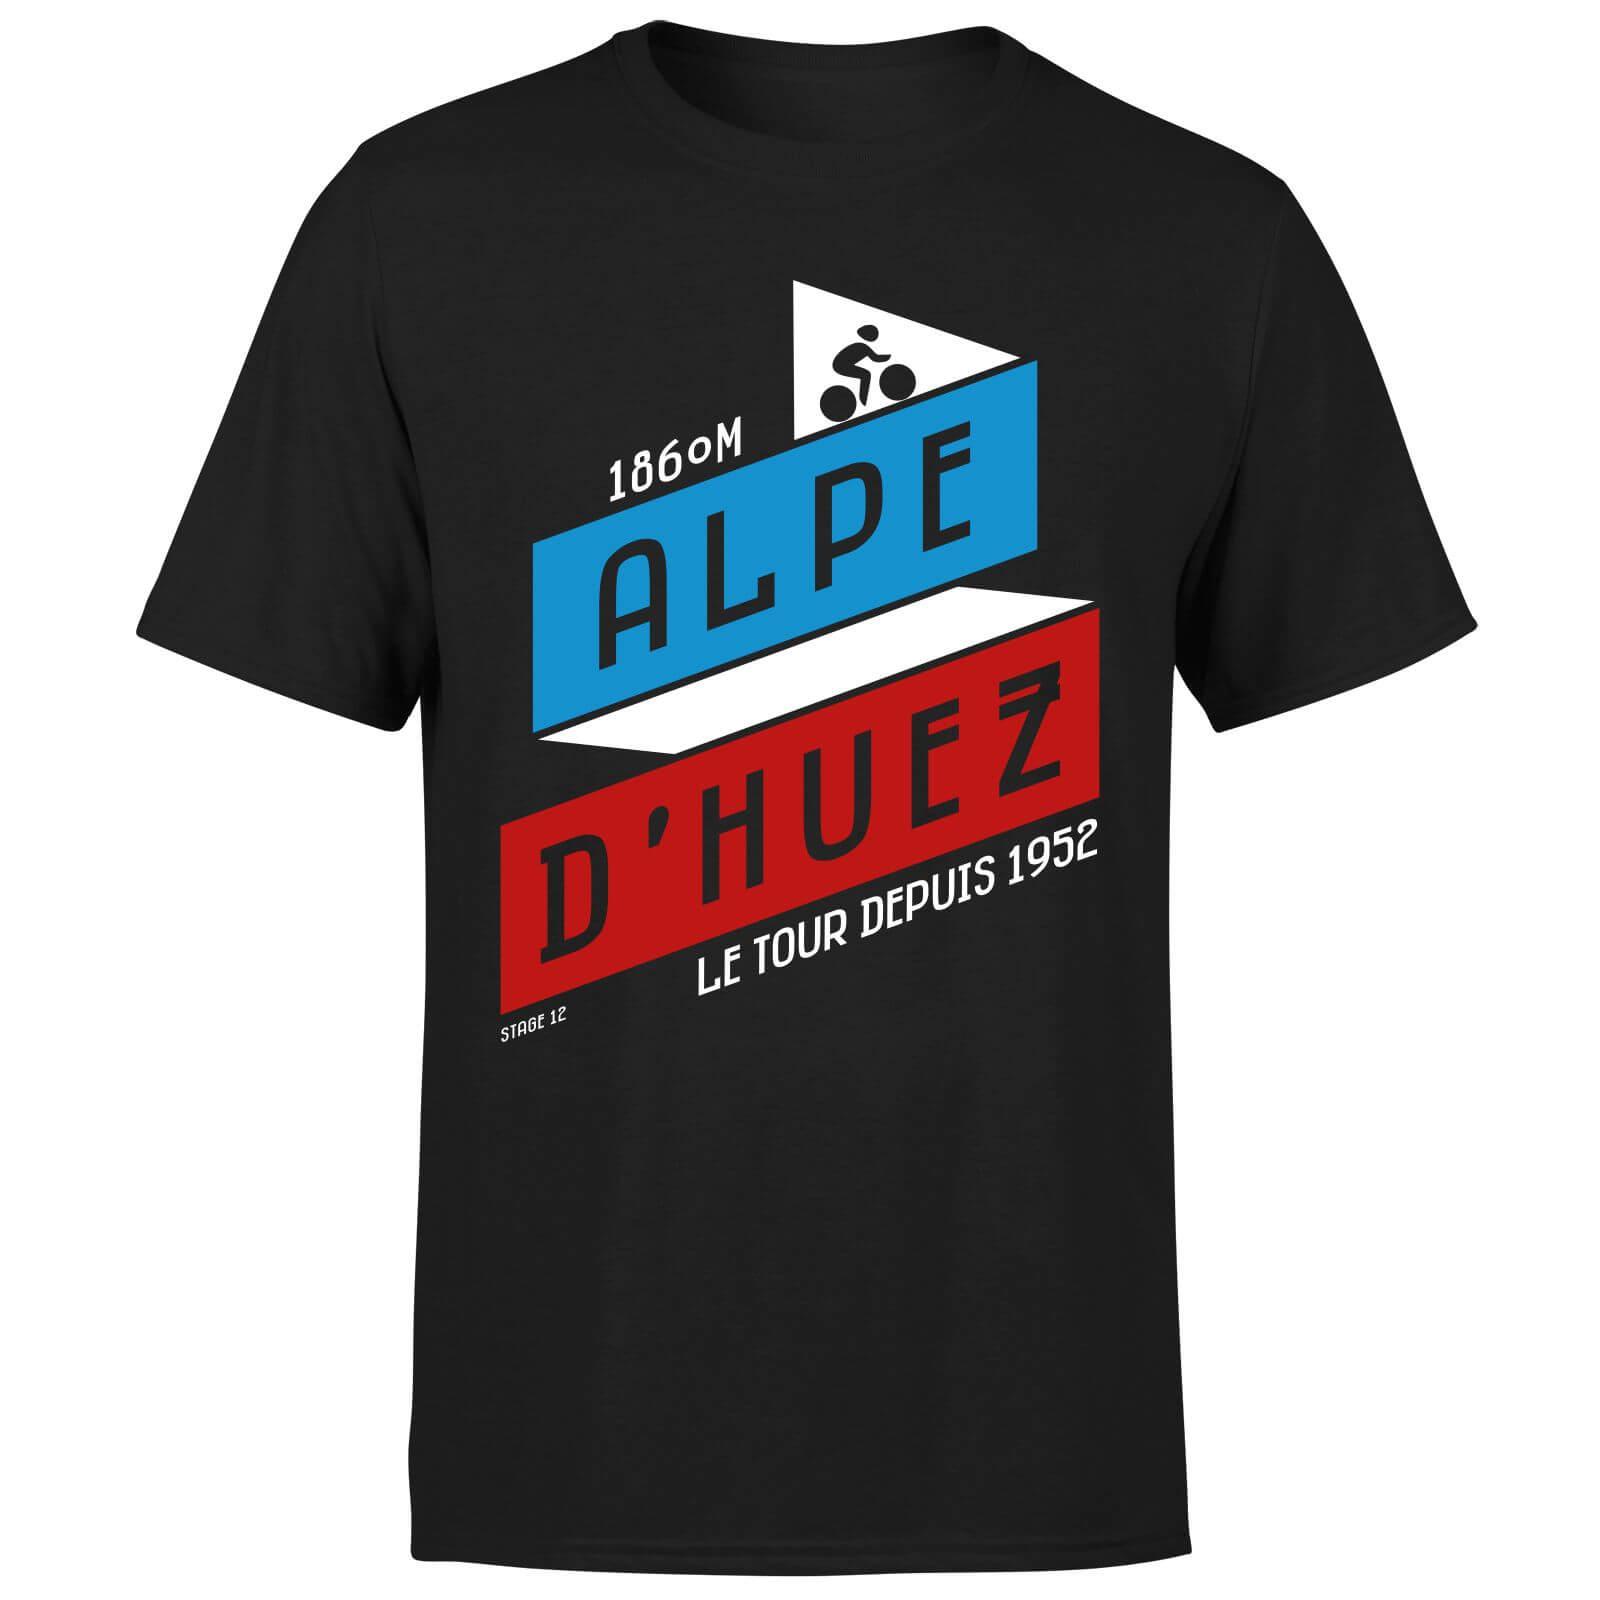 ALPE D'HUEZ Men's T-Shirt - Black - L - Black